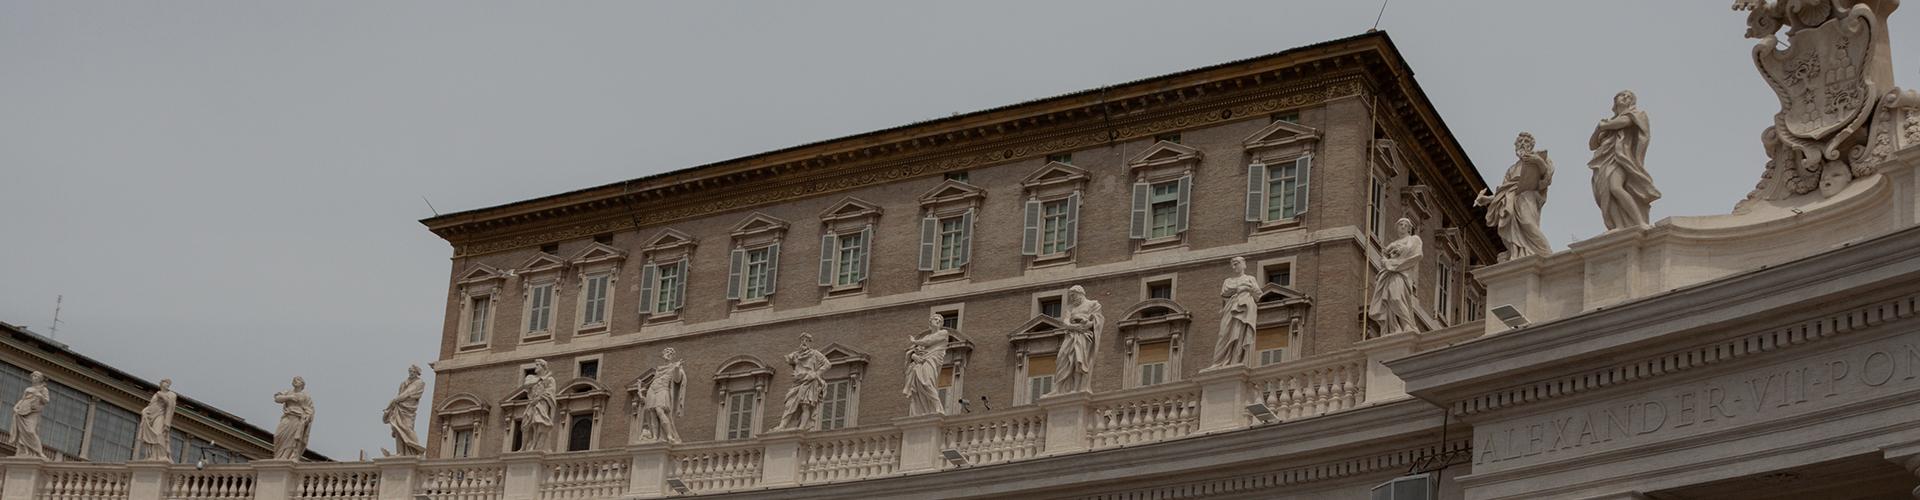 Landmark photograph of Vatican City